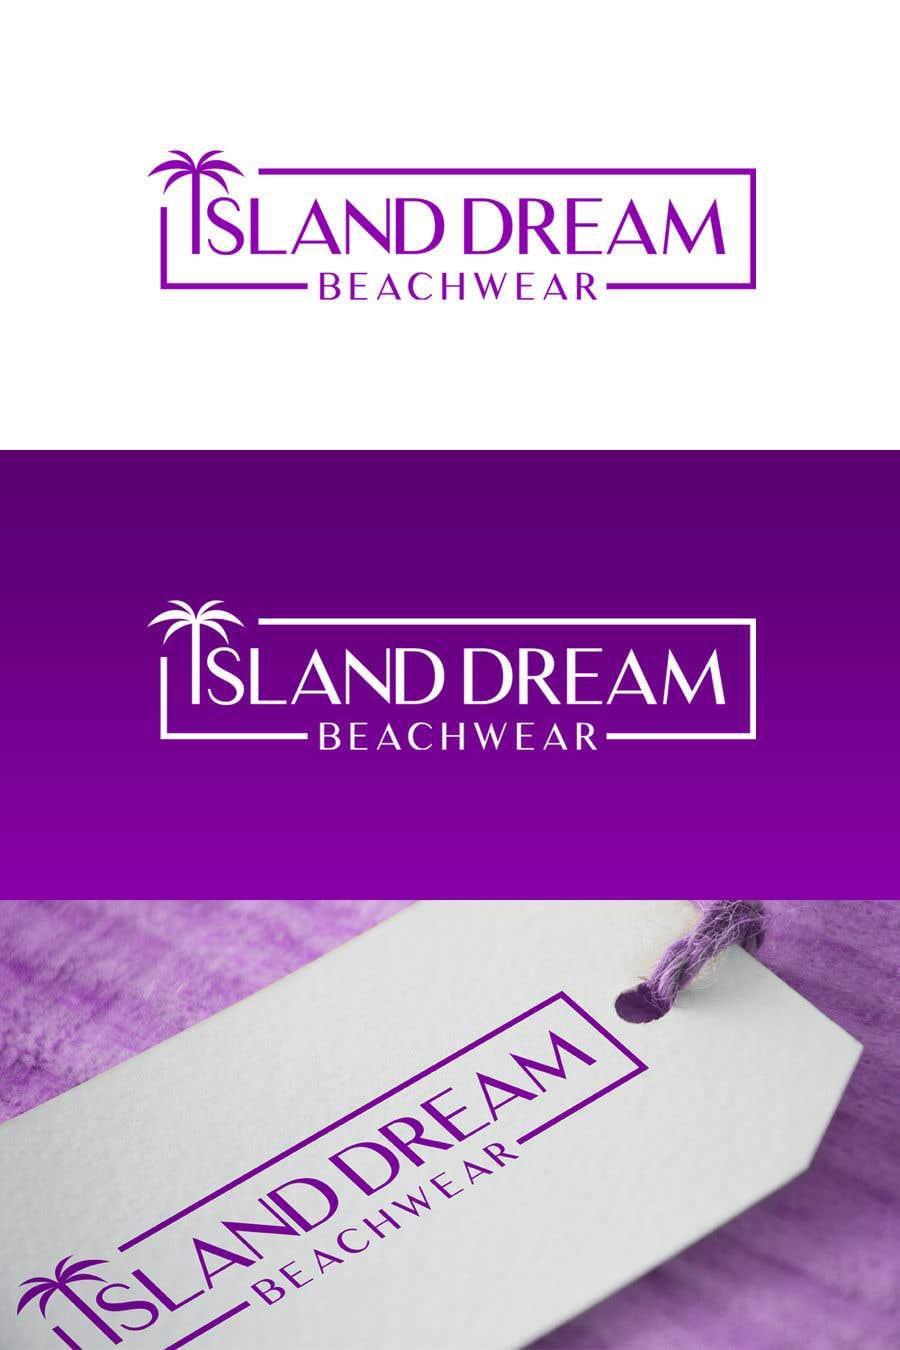 Konkurrenceindlæg #26 for Bikini beach brand - need a logo